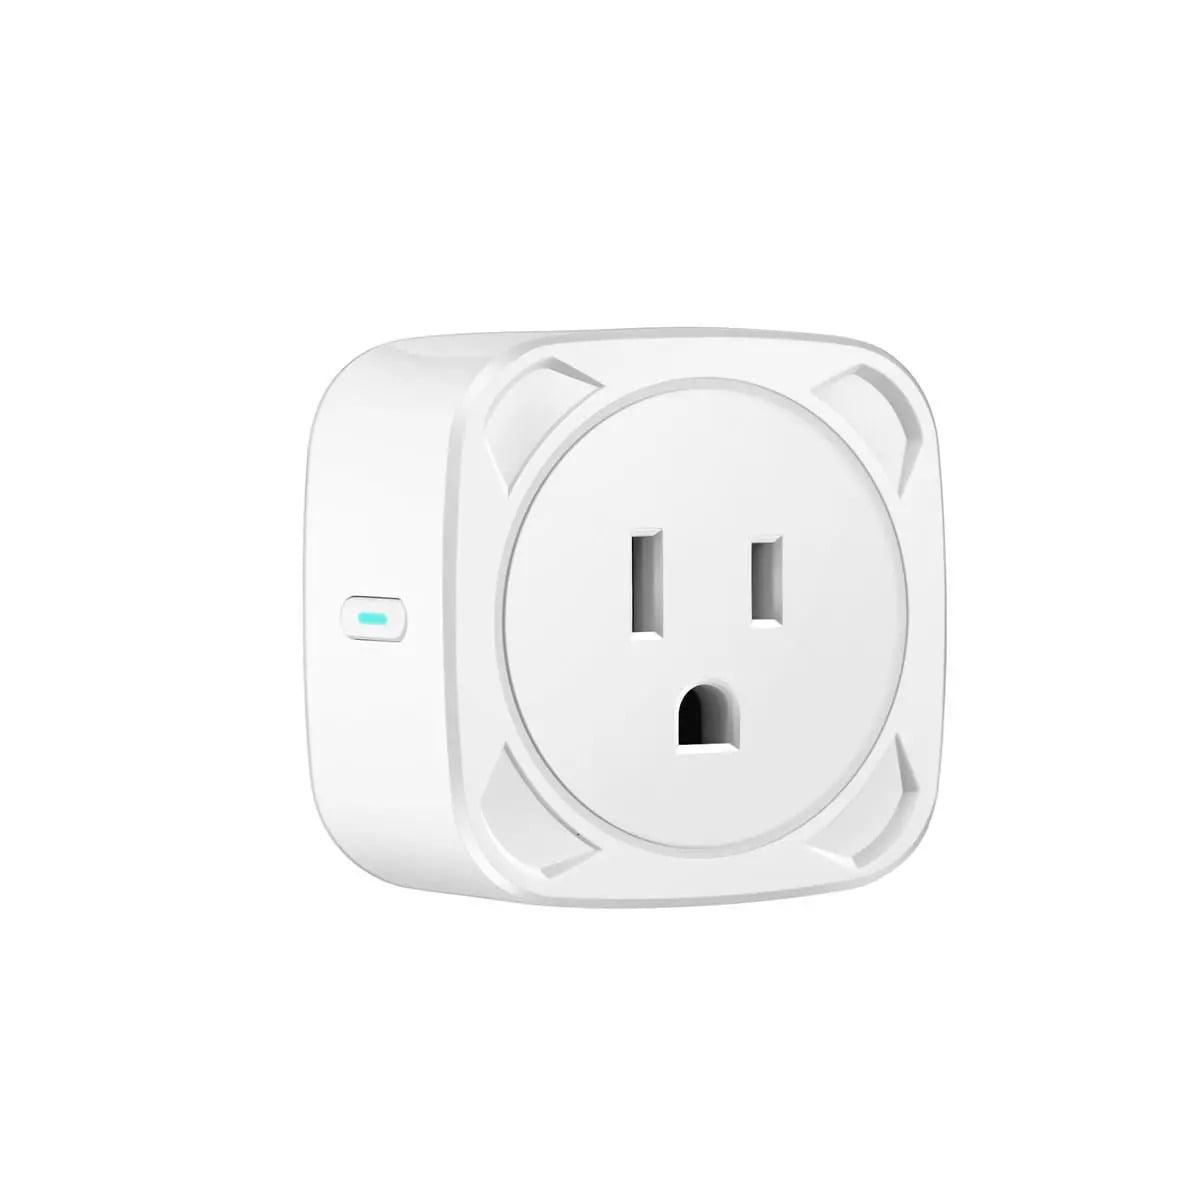 SP11 10A WiFi Smart Plug Socket Switch US Plug Remote control Power Strip Timing (9)